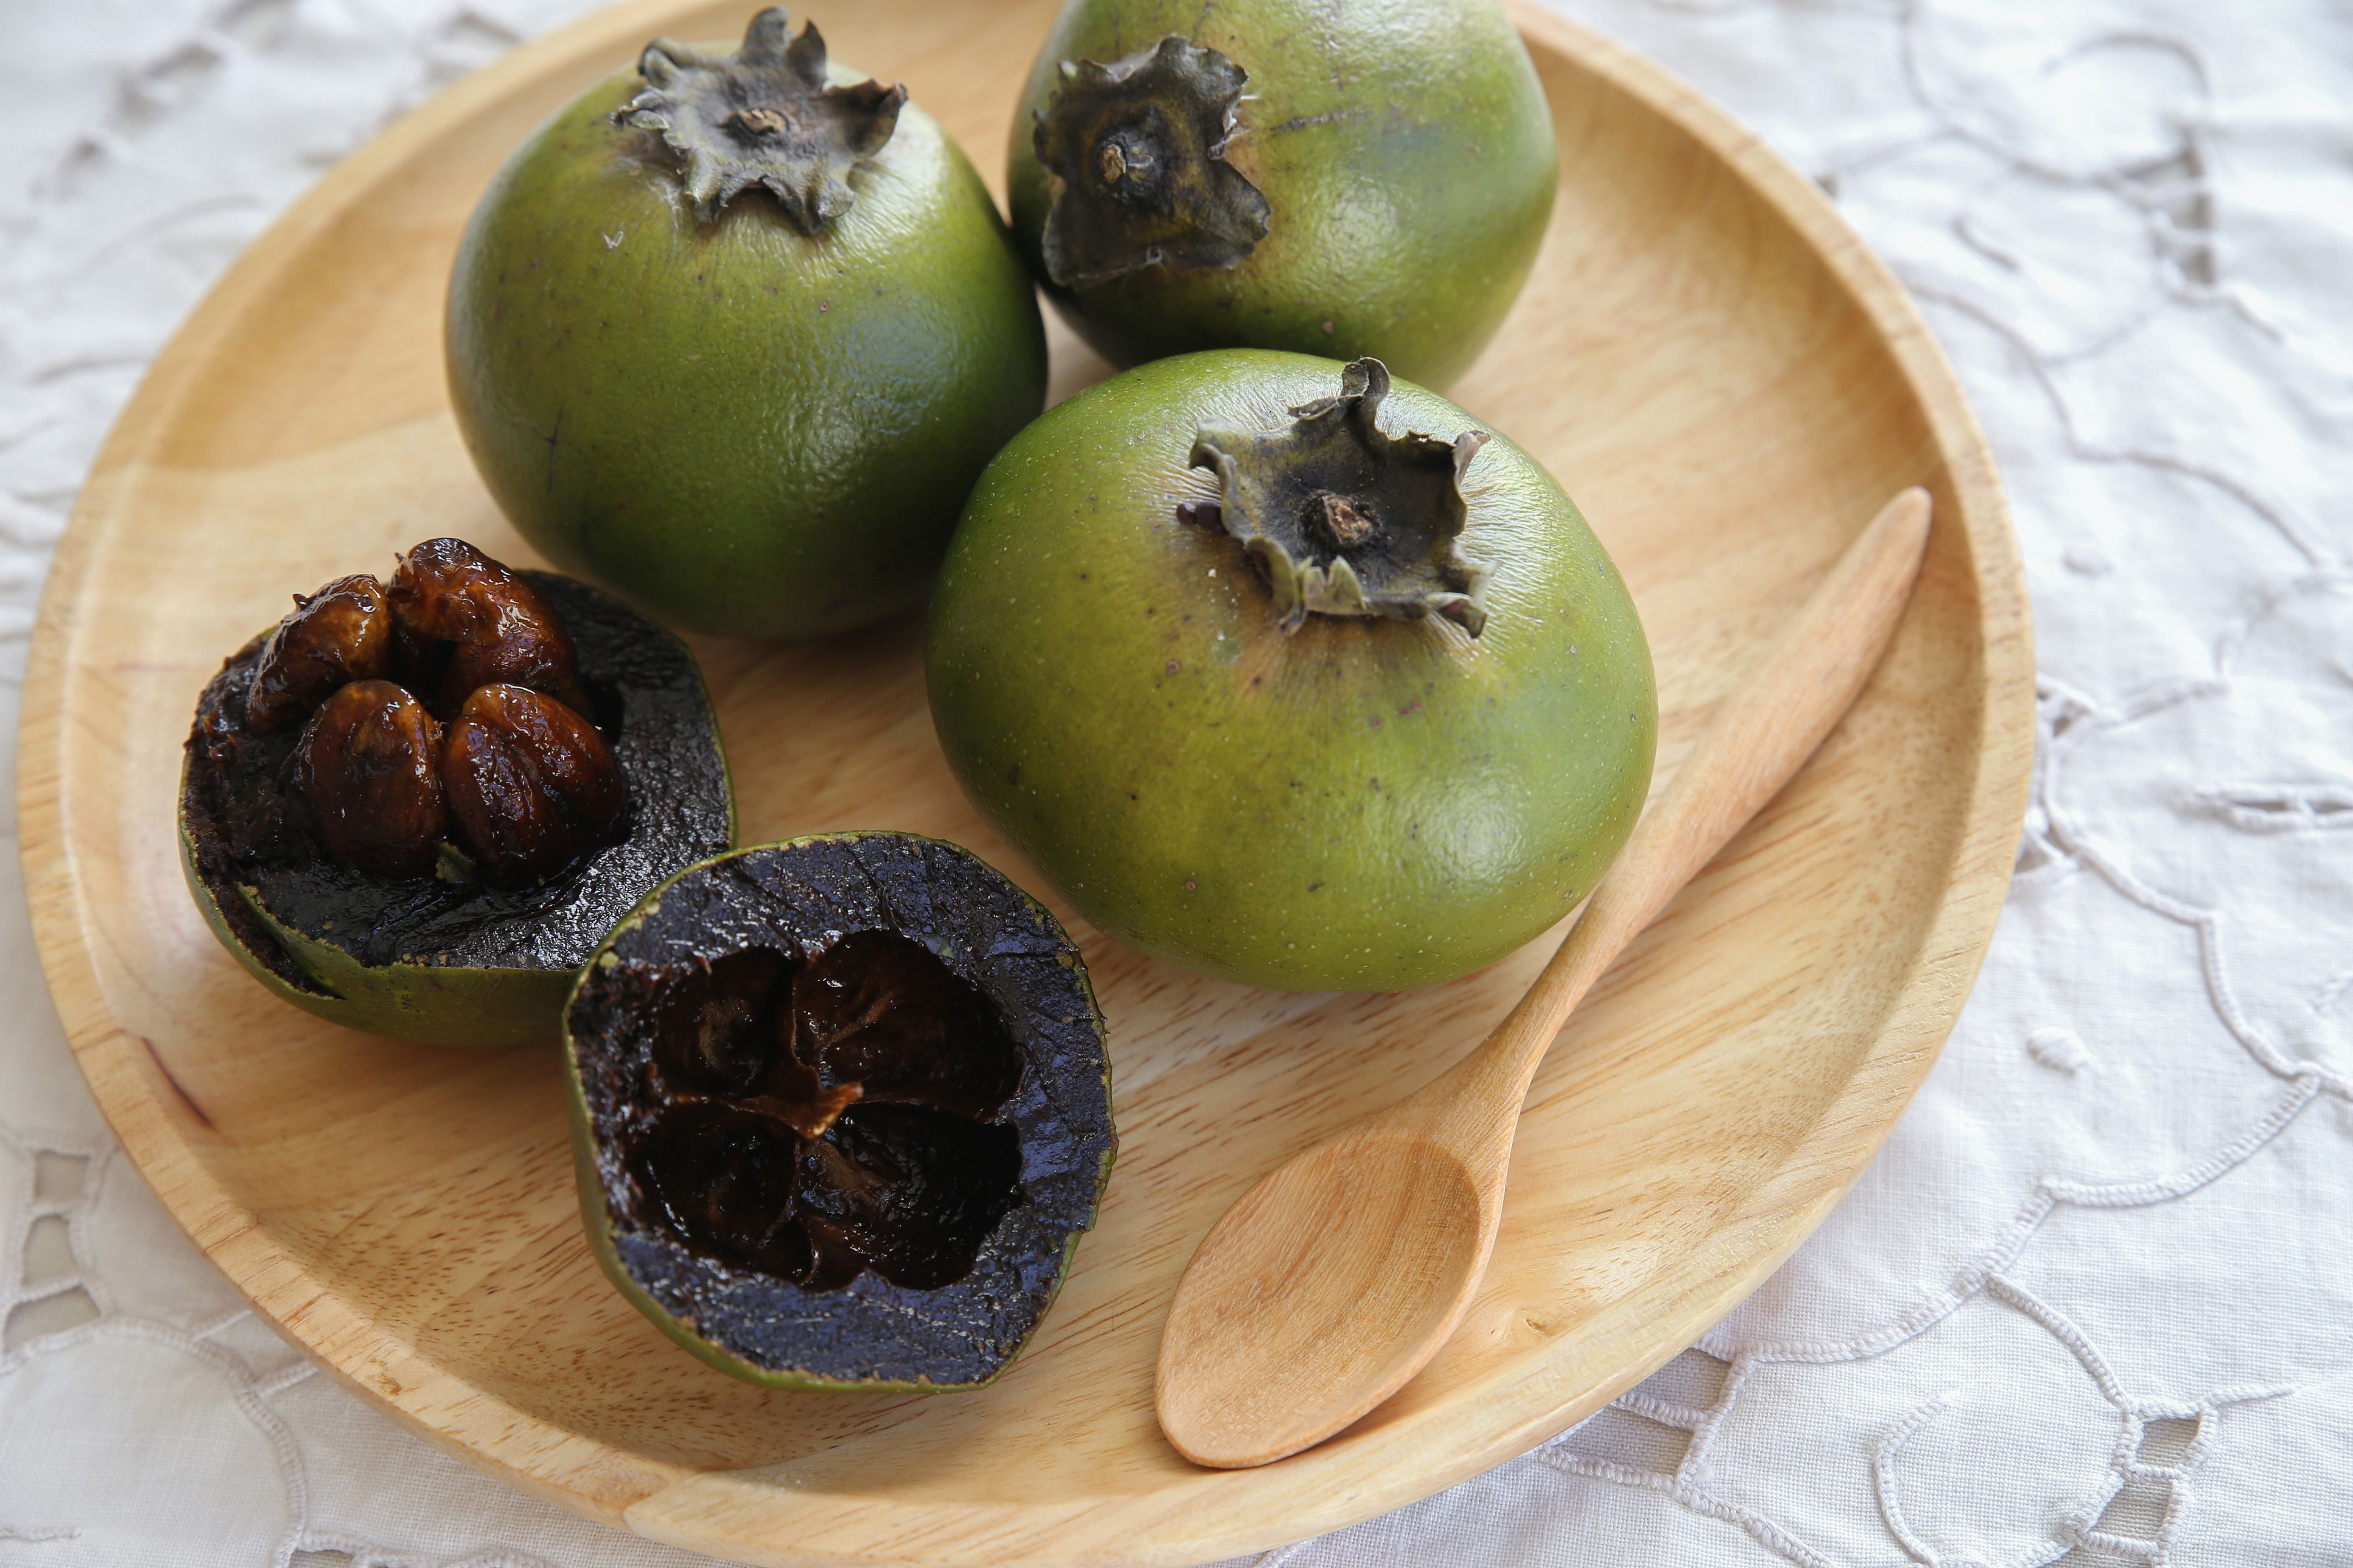 black sapote or chocolate pudding fruit 5ade1b333de f0e0